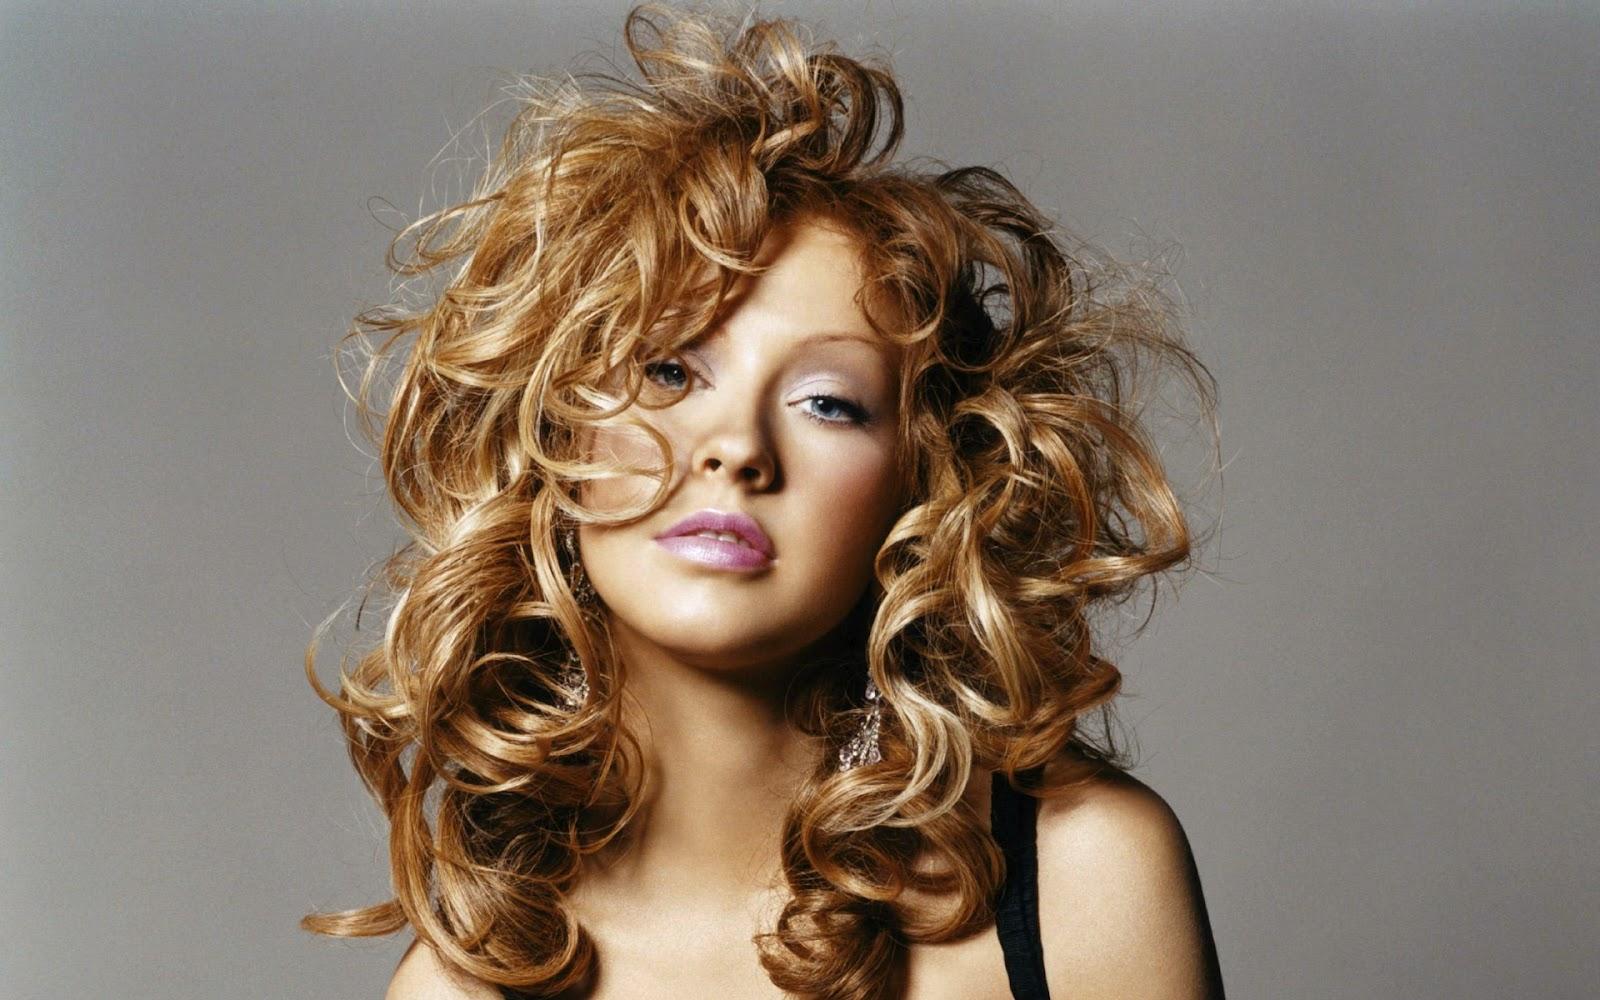 hairstyle background - photo #18